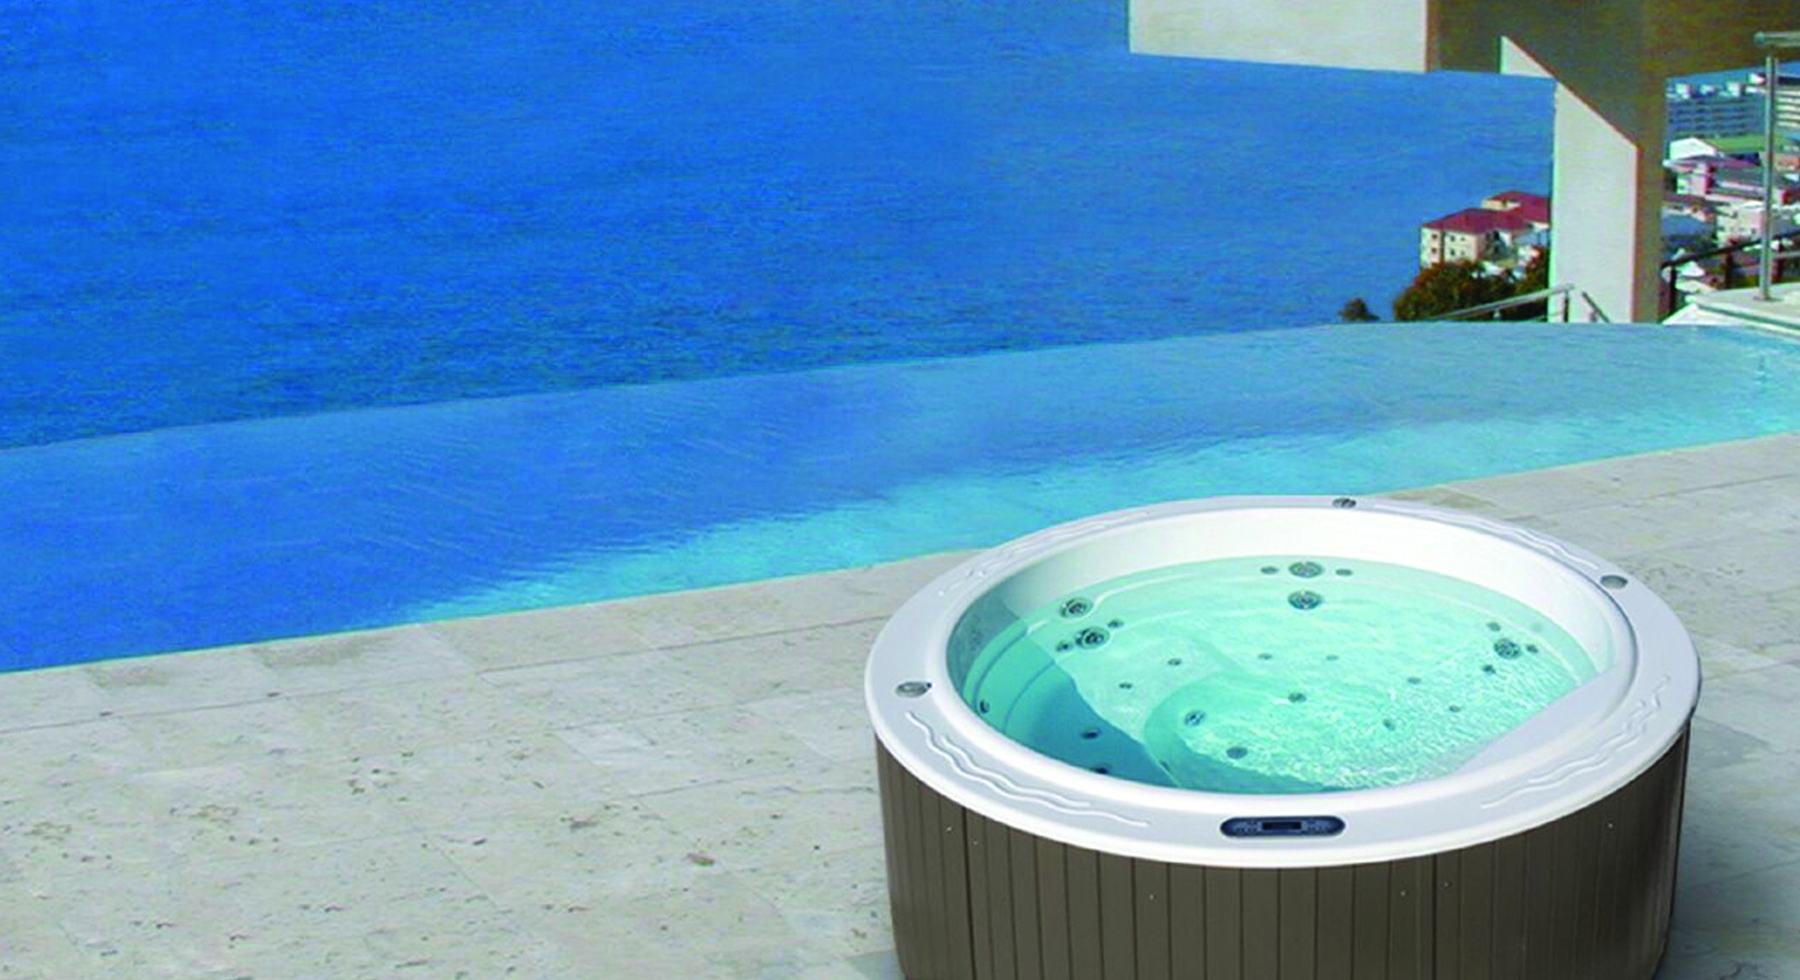 Spa Sundown gamme Aqualife